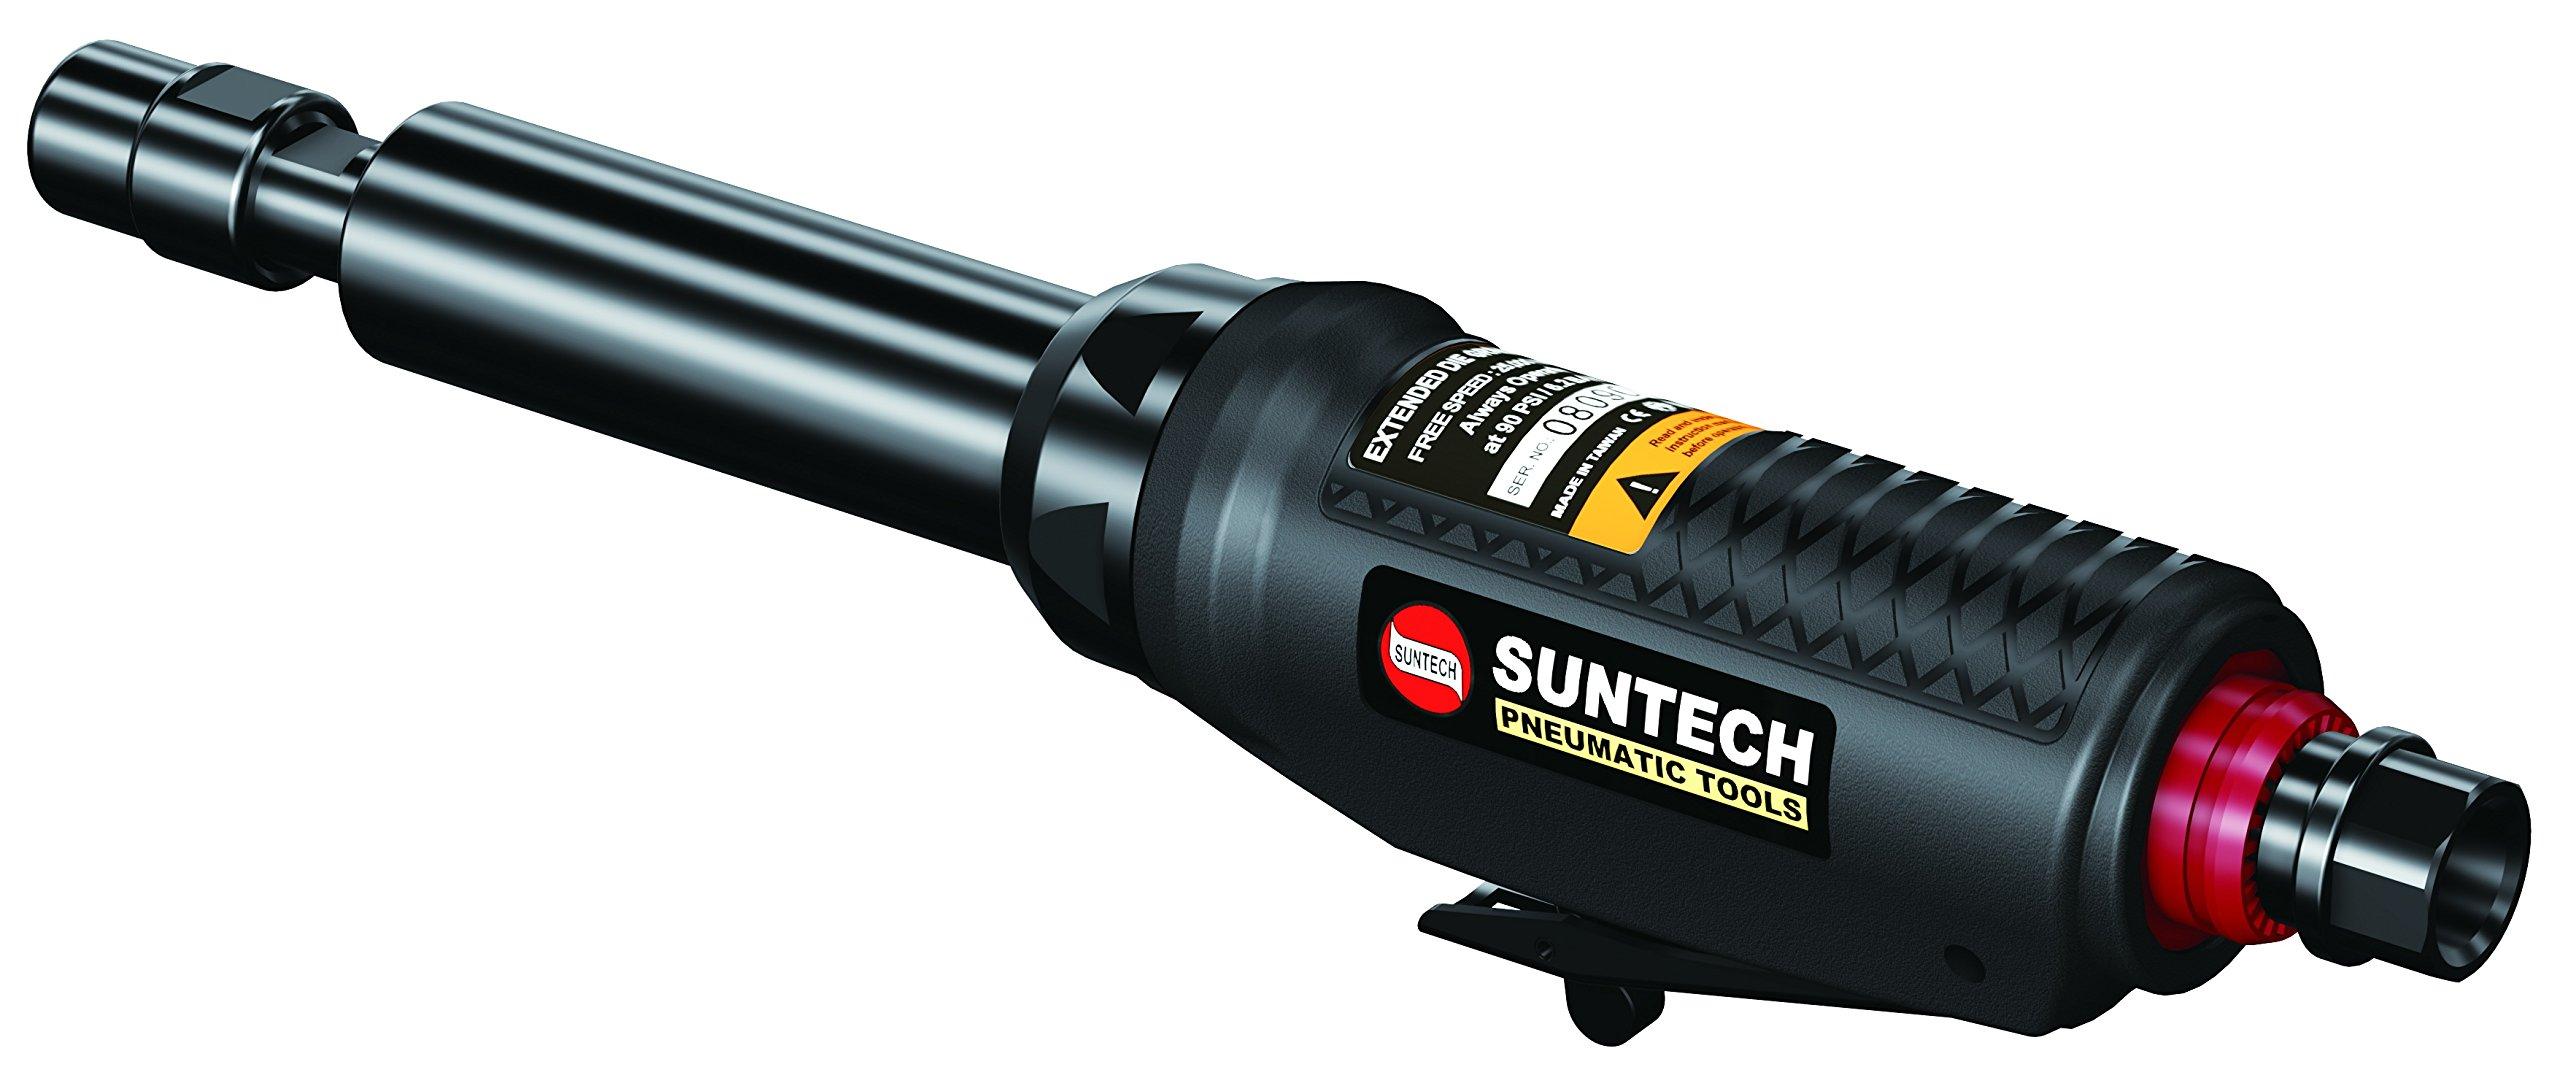 SUNTECH SM-5E-5300 Sunmatch Power Die Grinders, Black